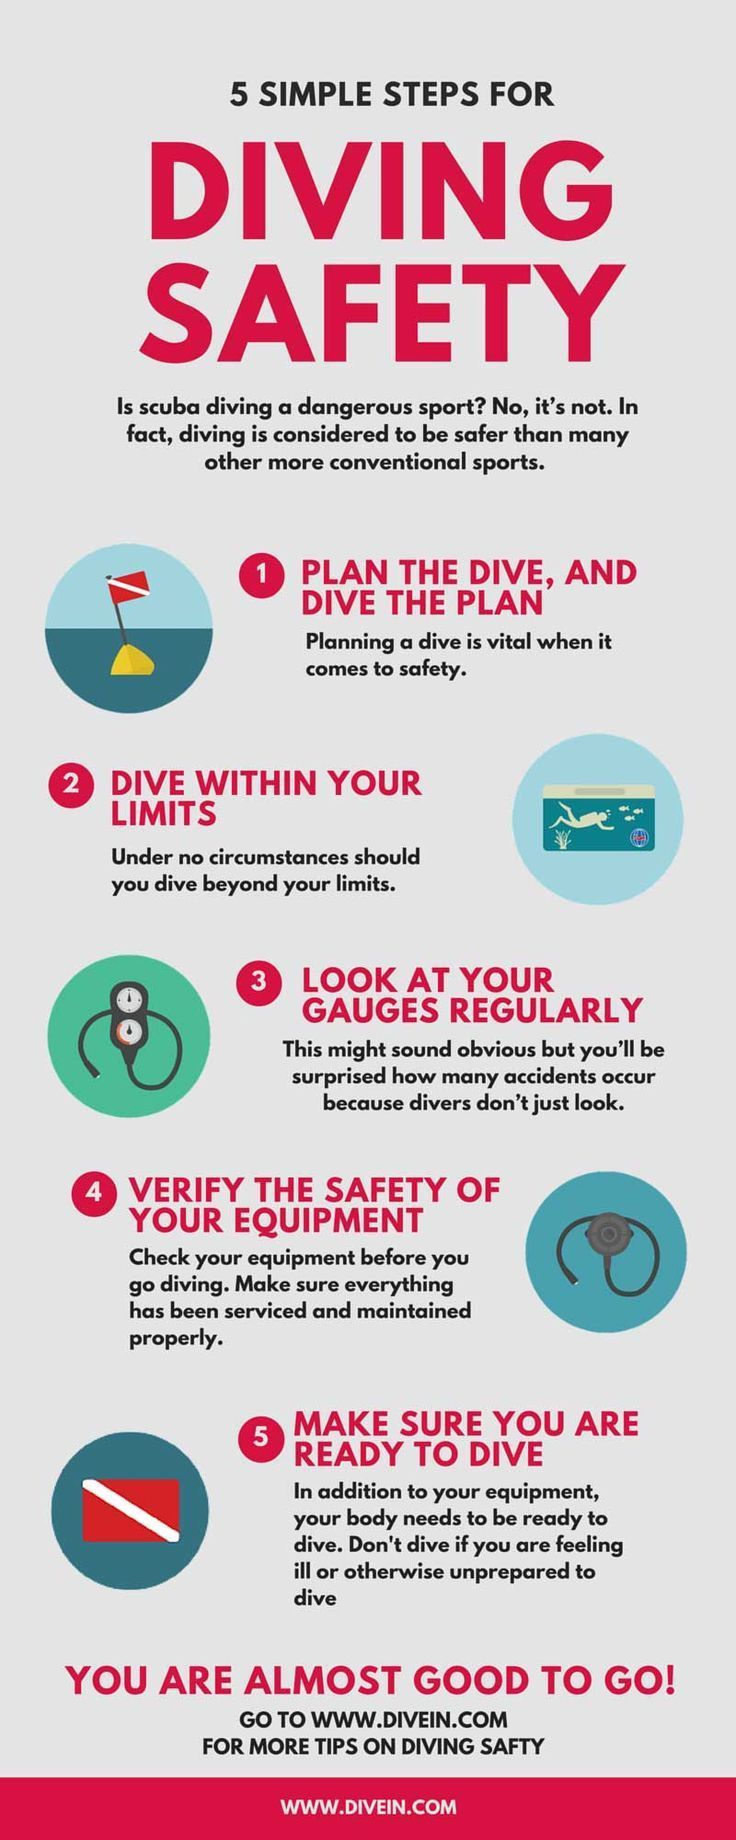 11 Practical Tips For Safe(r) Scuba Diving Scuba diving